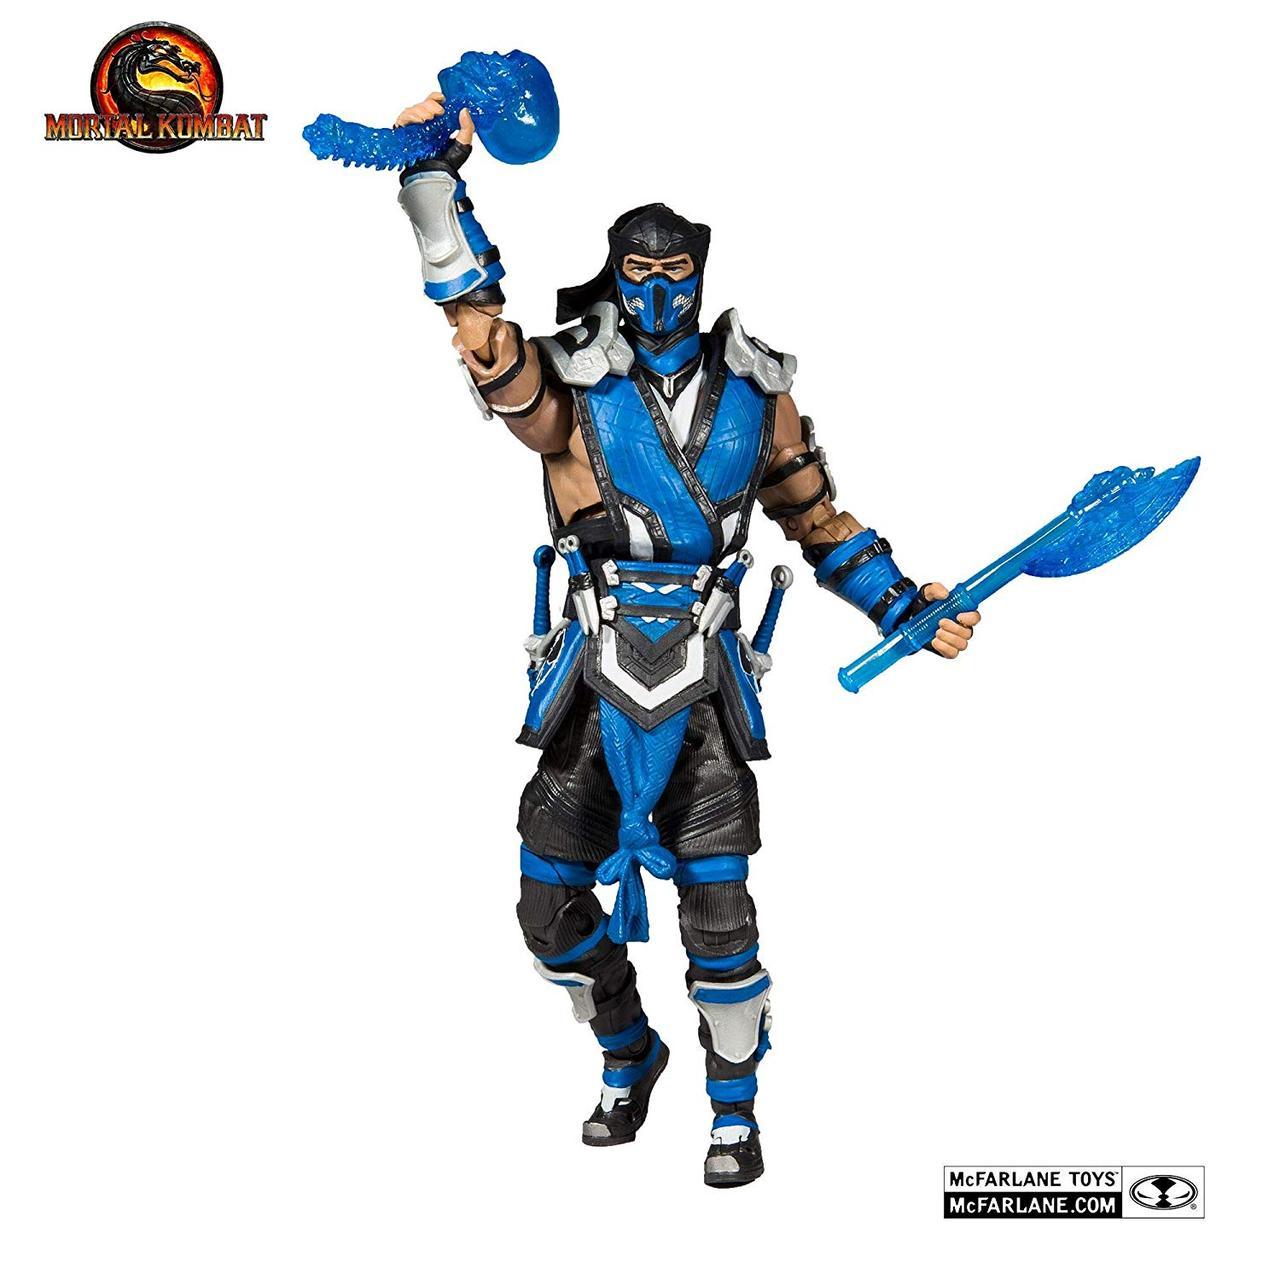 Mortal Kombat Коллекционная фигурка Саб-Зиро (с оружием)